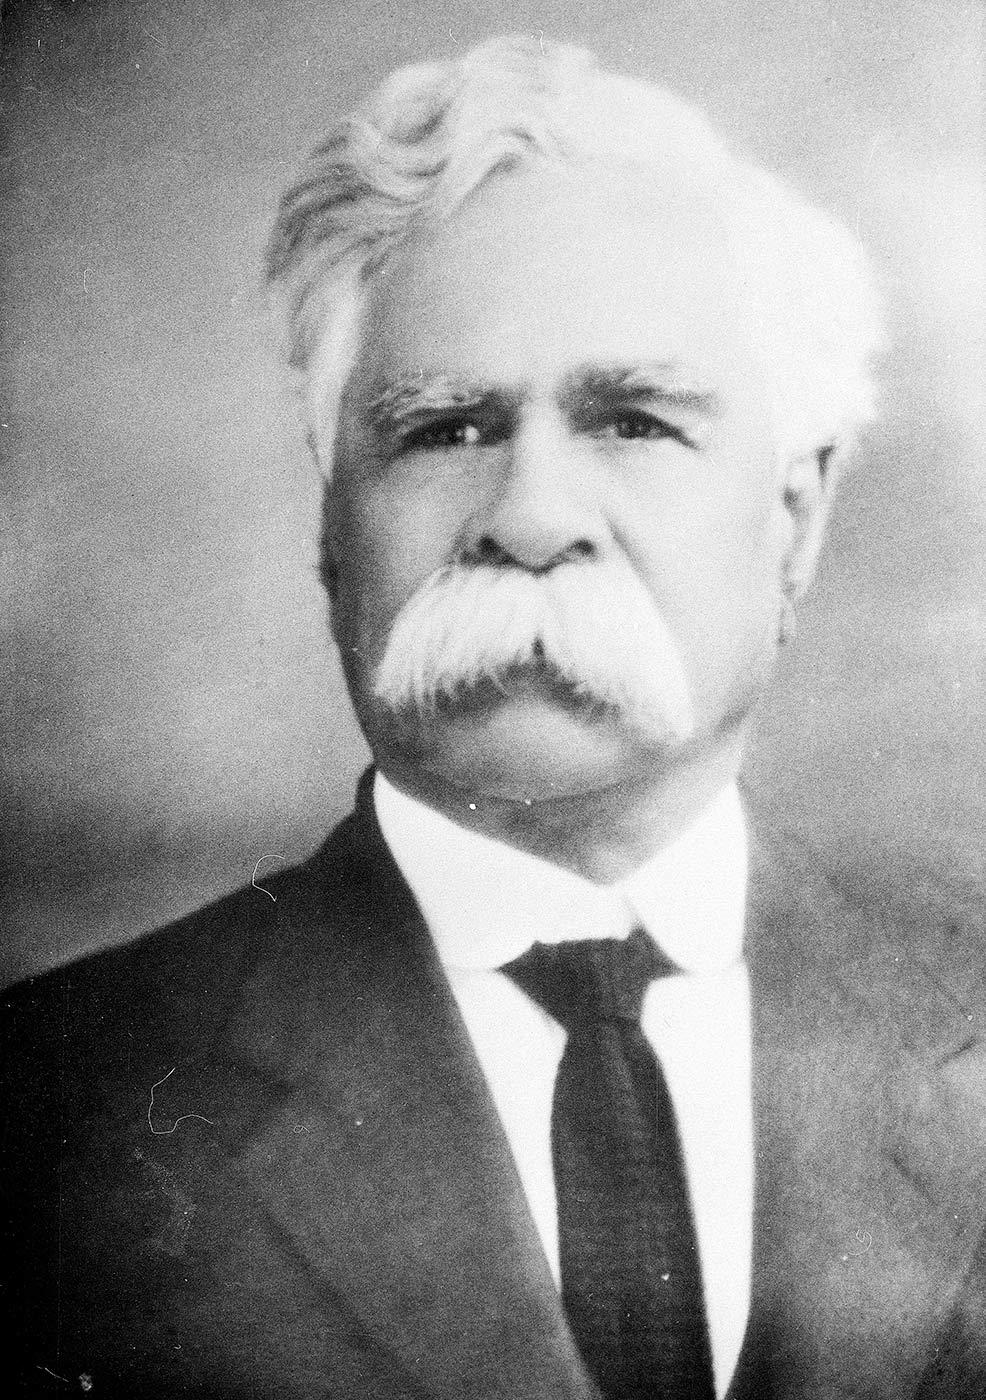 1936: Yorta Yorta elder William Cooper founds the Australian Aborigines' League (National Museum of Australia, n.d.)